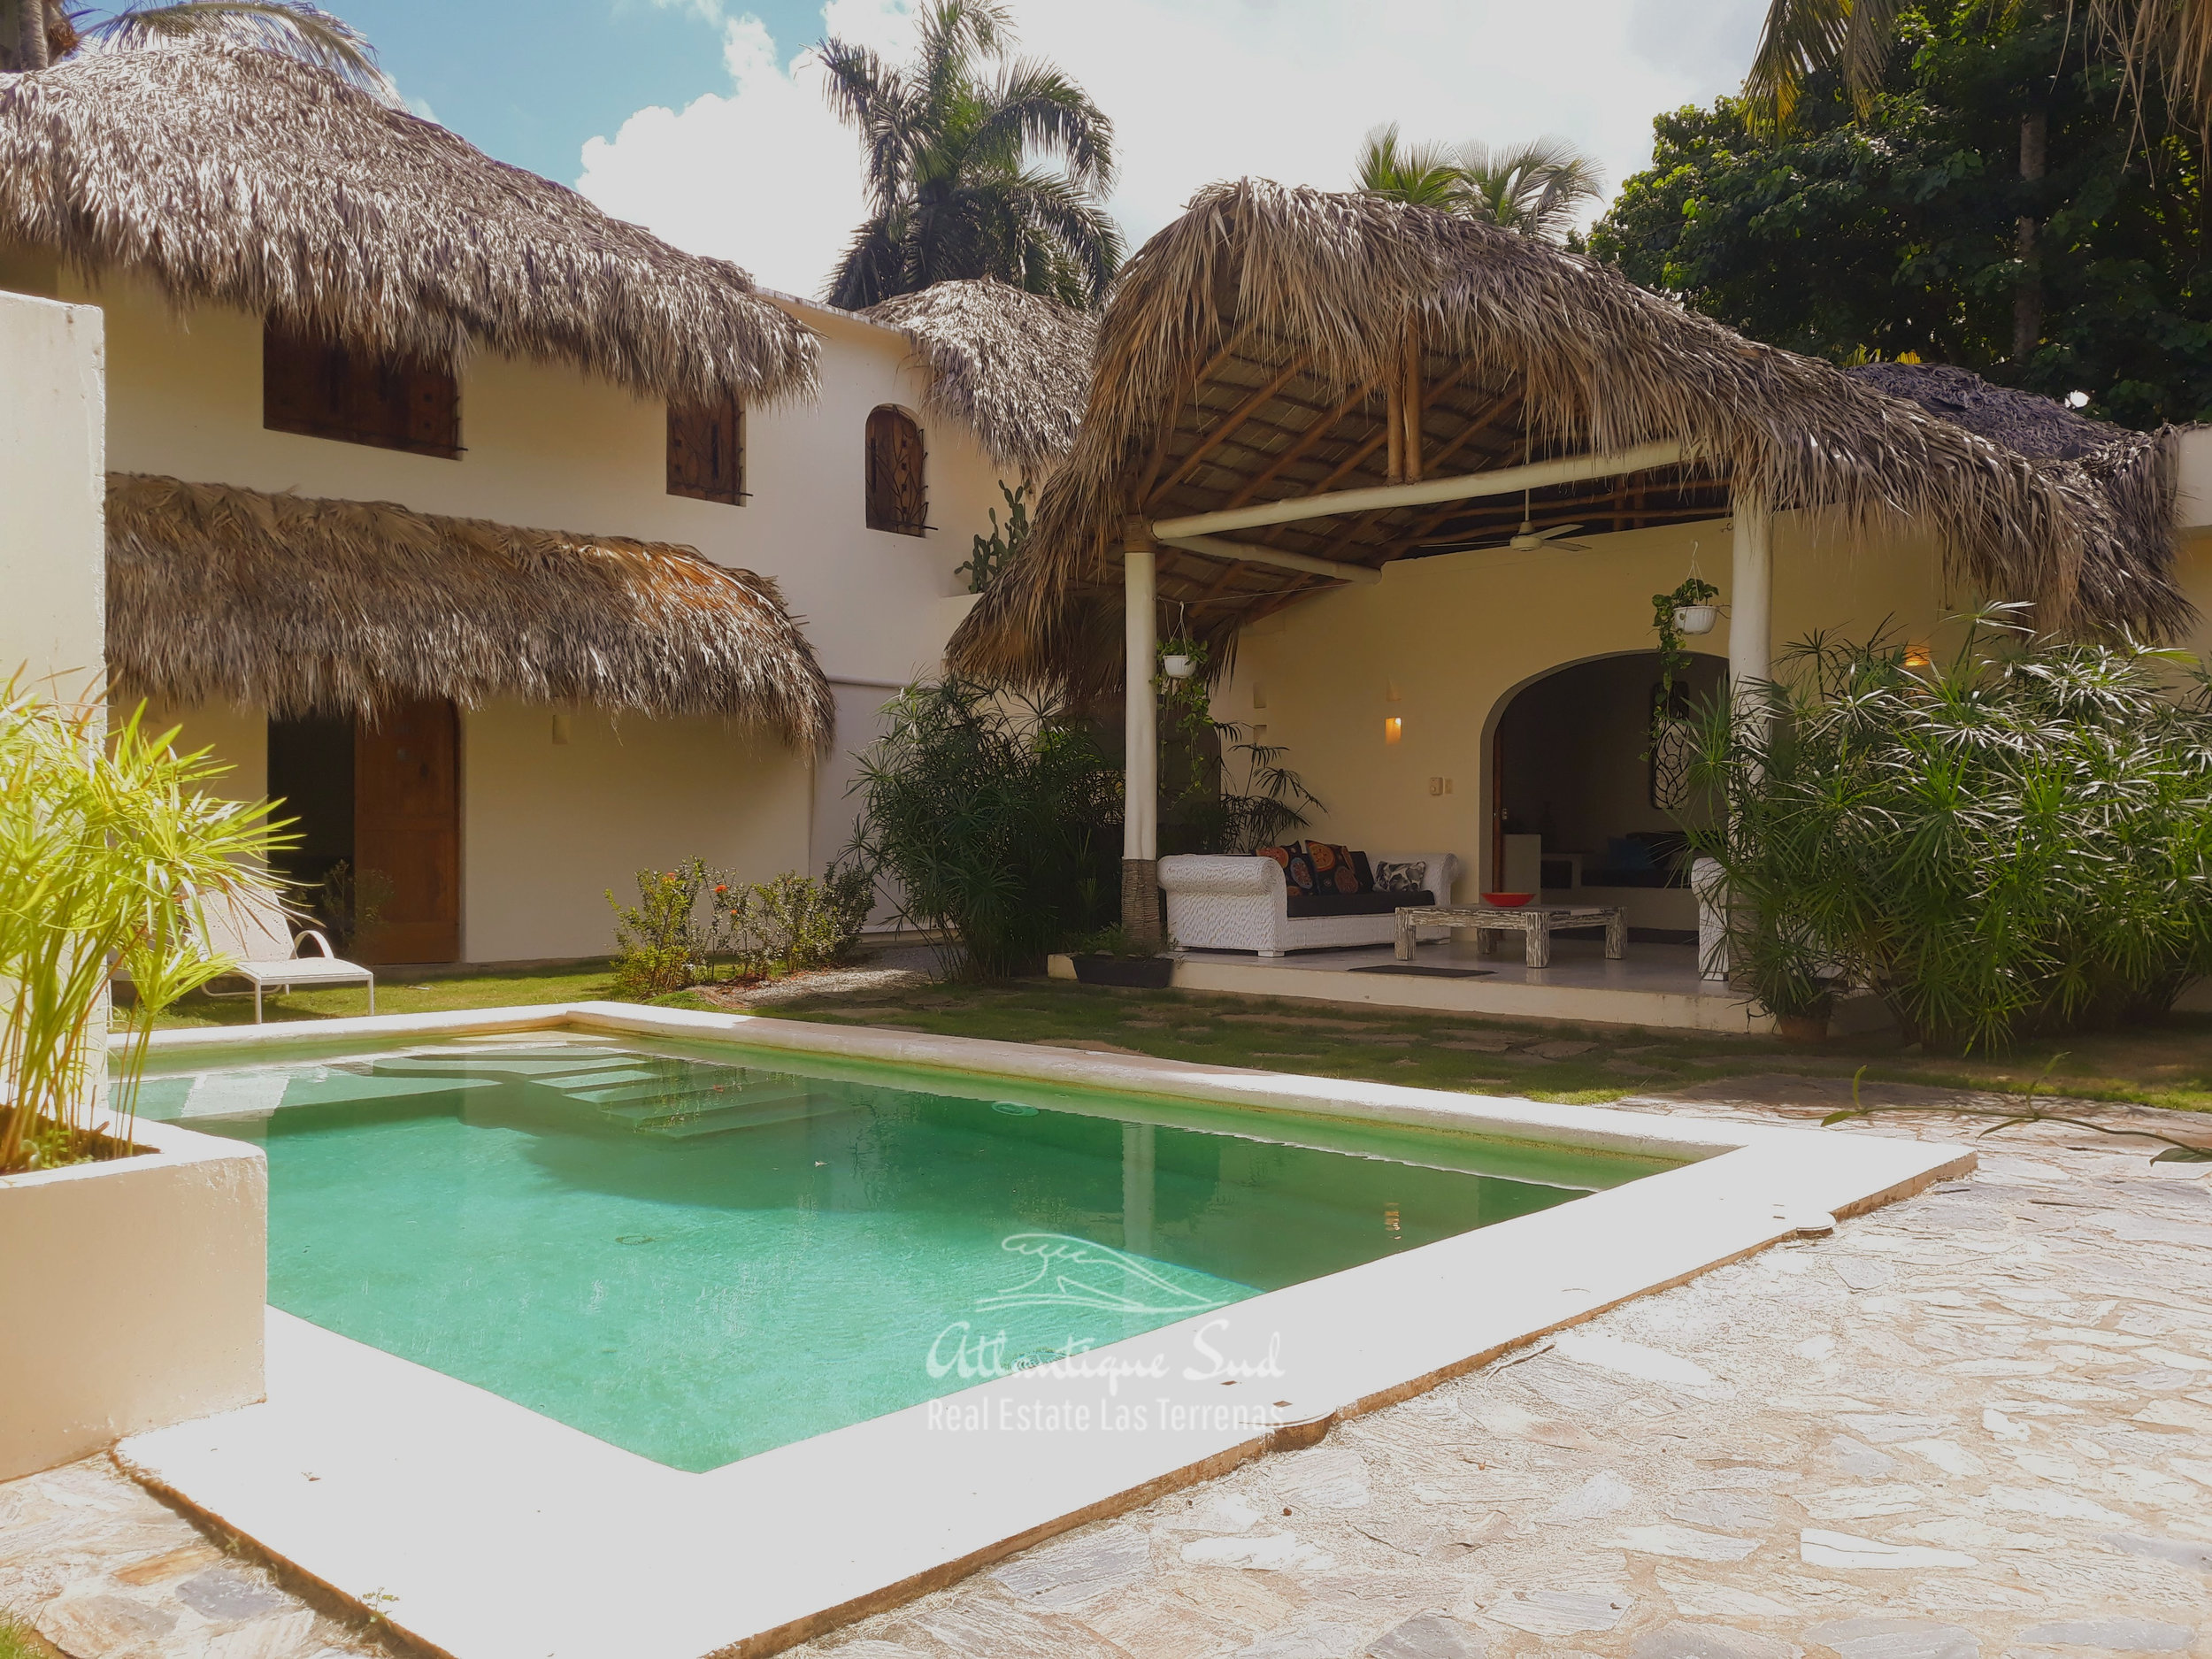 Authentic Caribbean Villa in quiet community in Real Estate Las Terrenas Atlantique Sud4.jpg